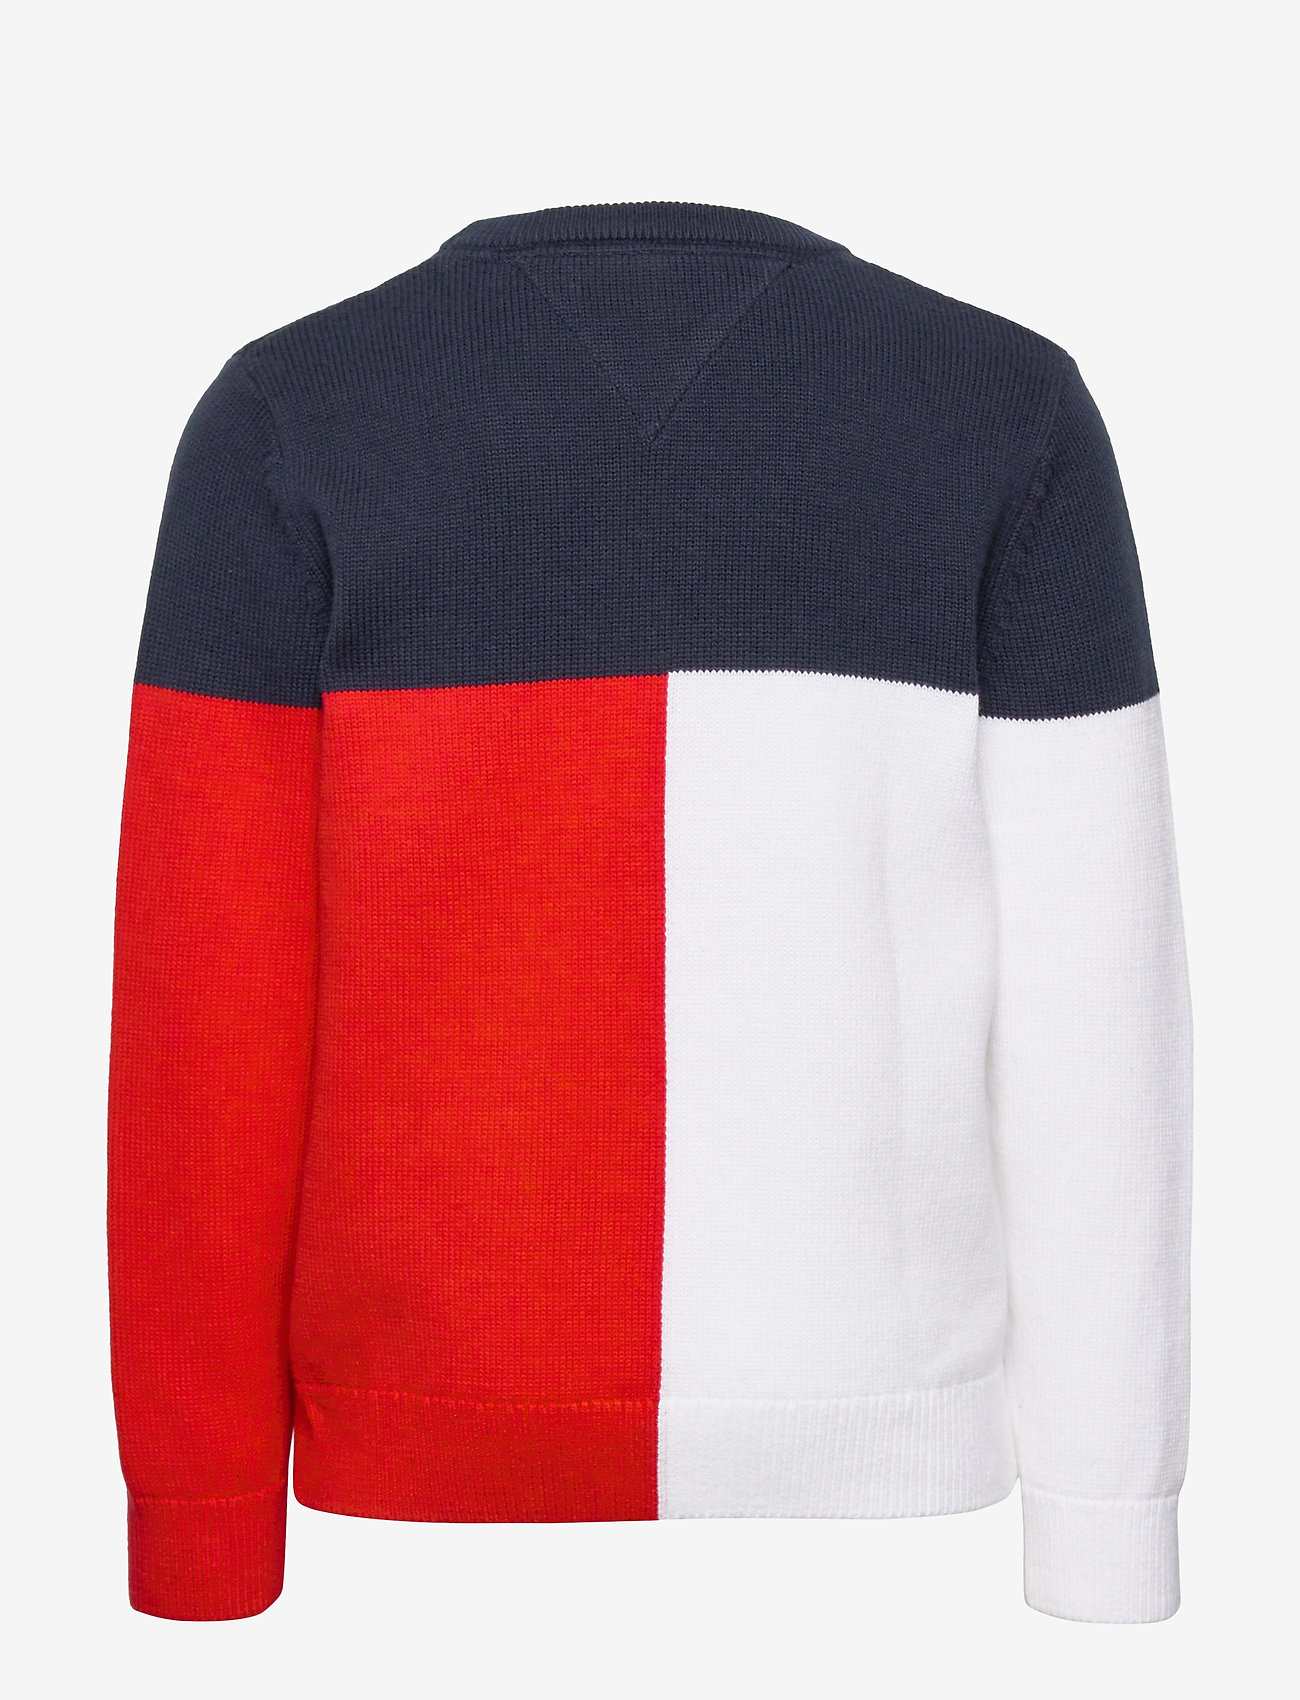 Tommy Hilfiger - HILFIGER COLORBLOCK SWEATER - sweatshirts - twilight navy - 1